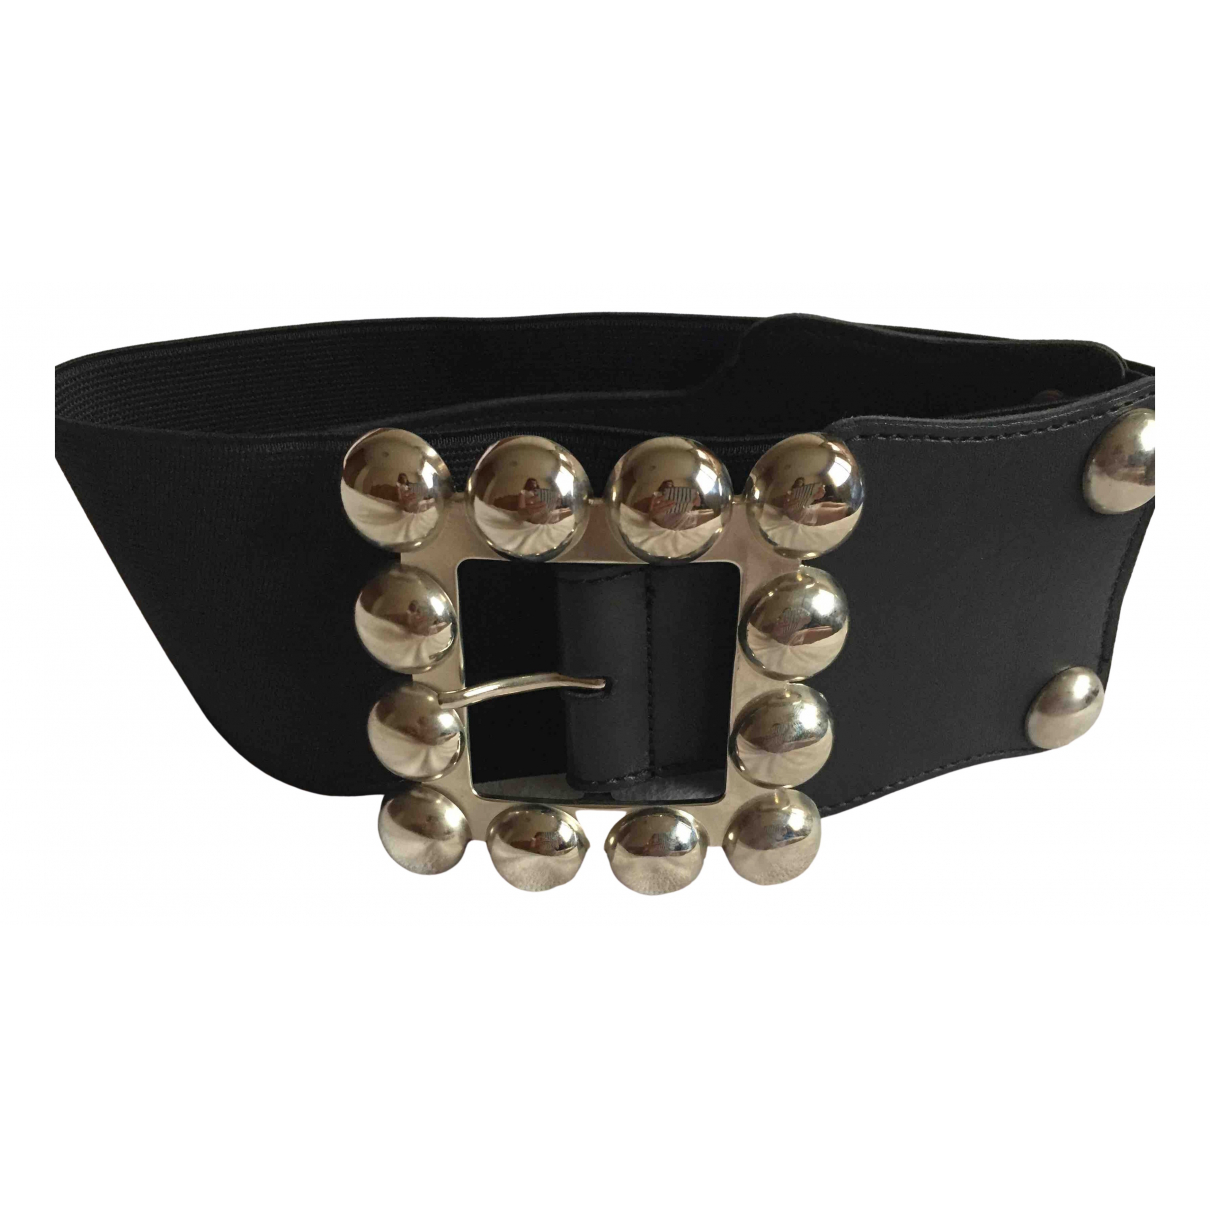 Georges Rech \N Black Leather belt for Women S International